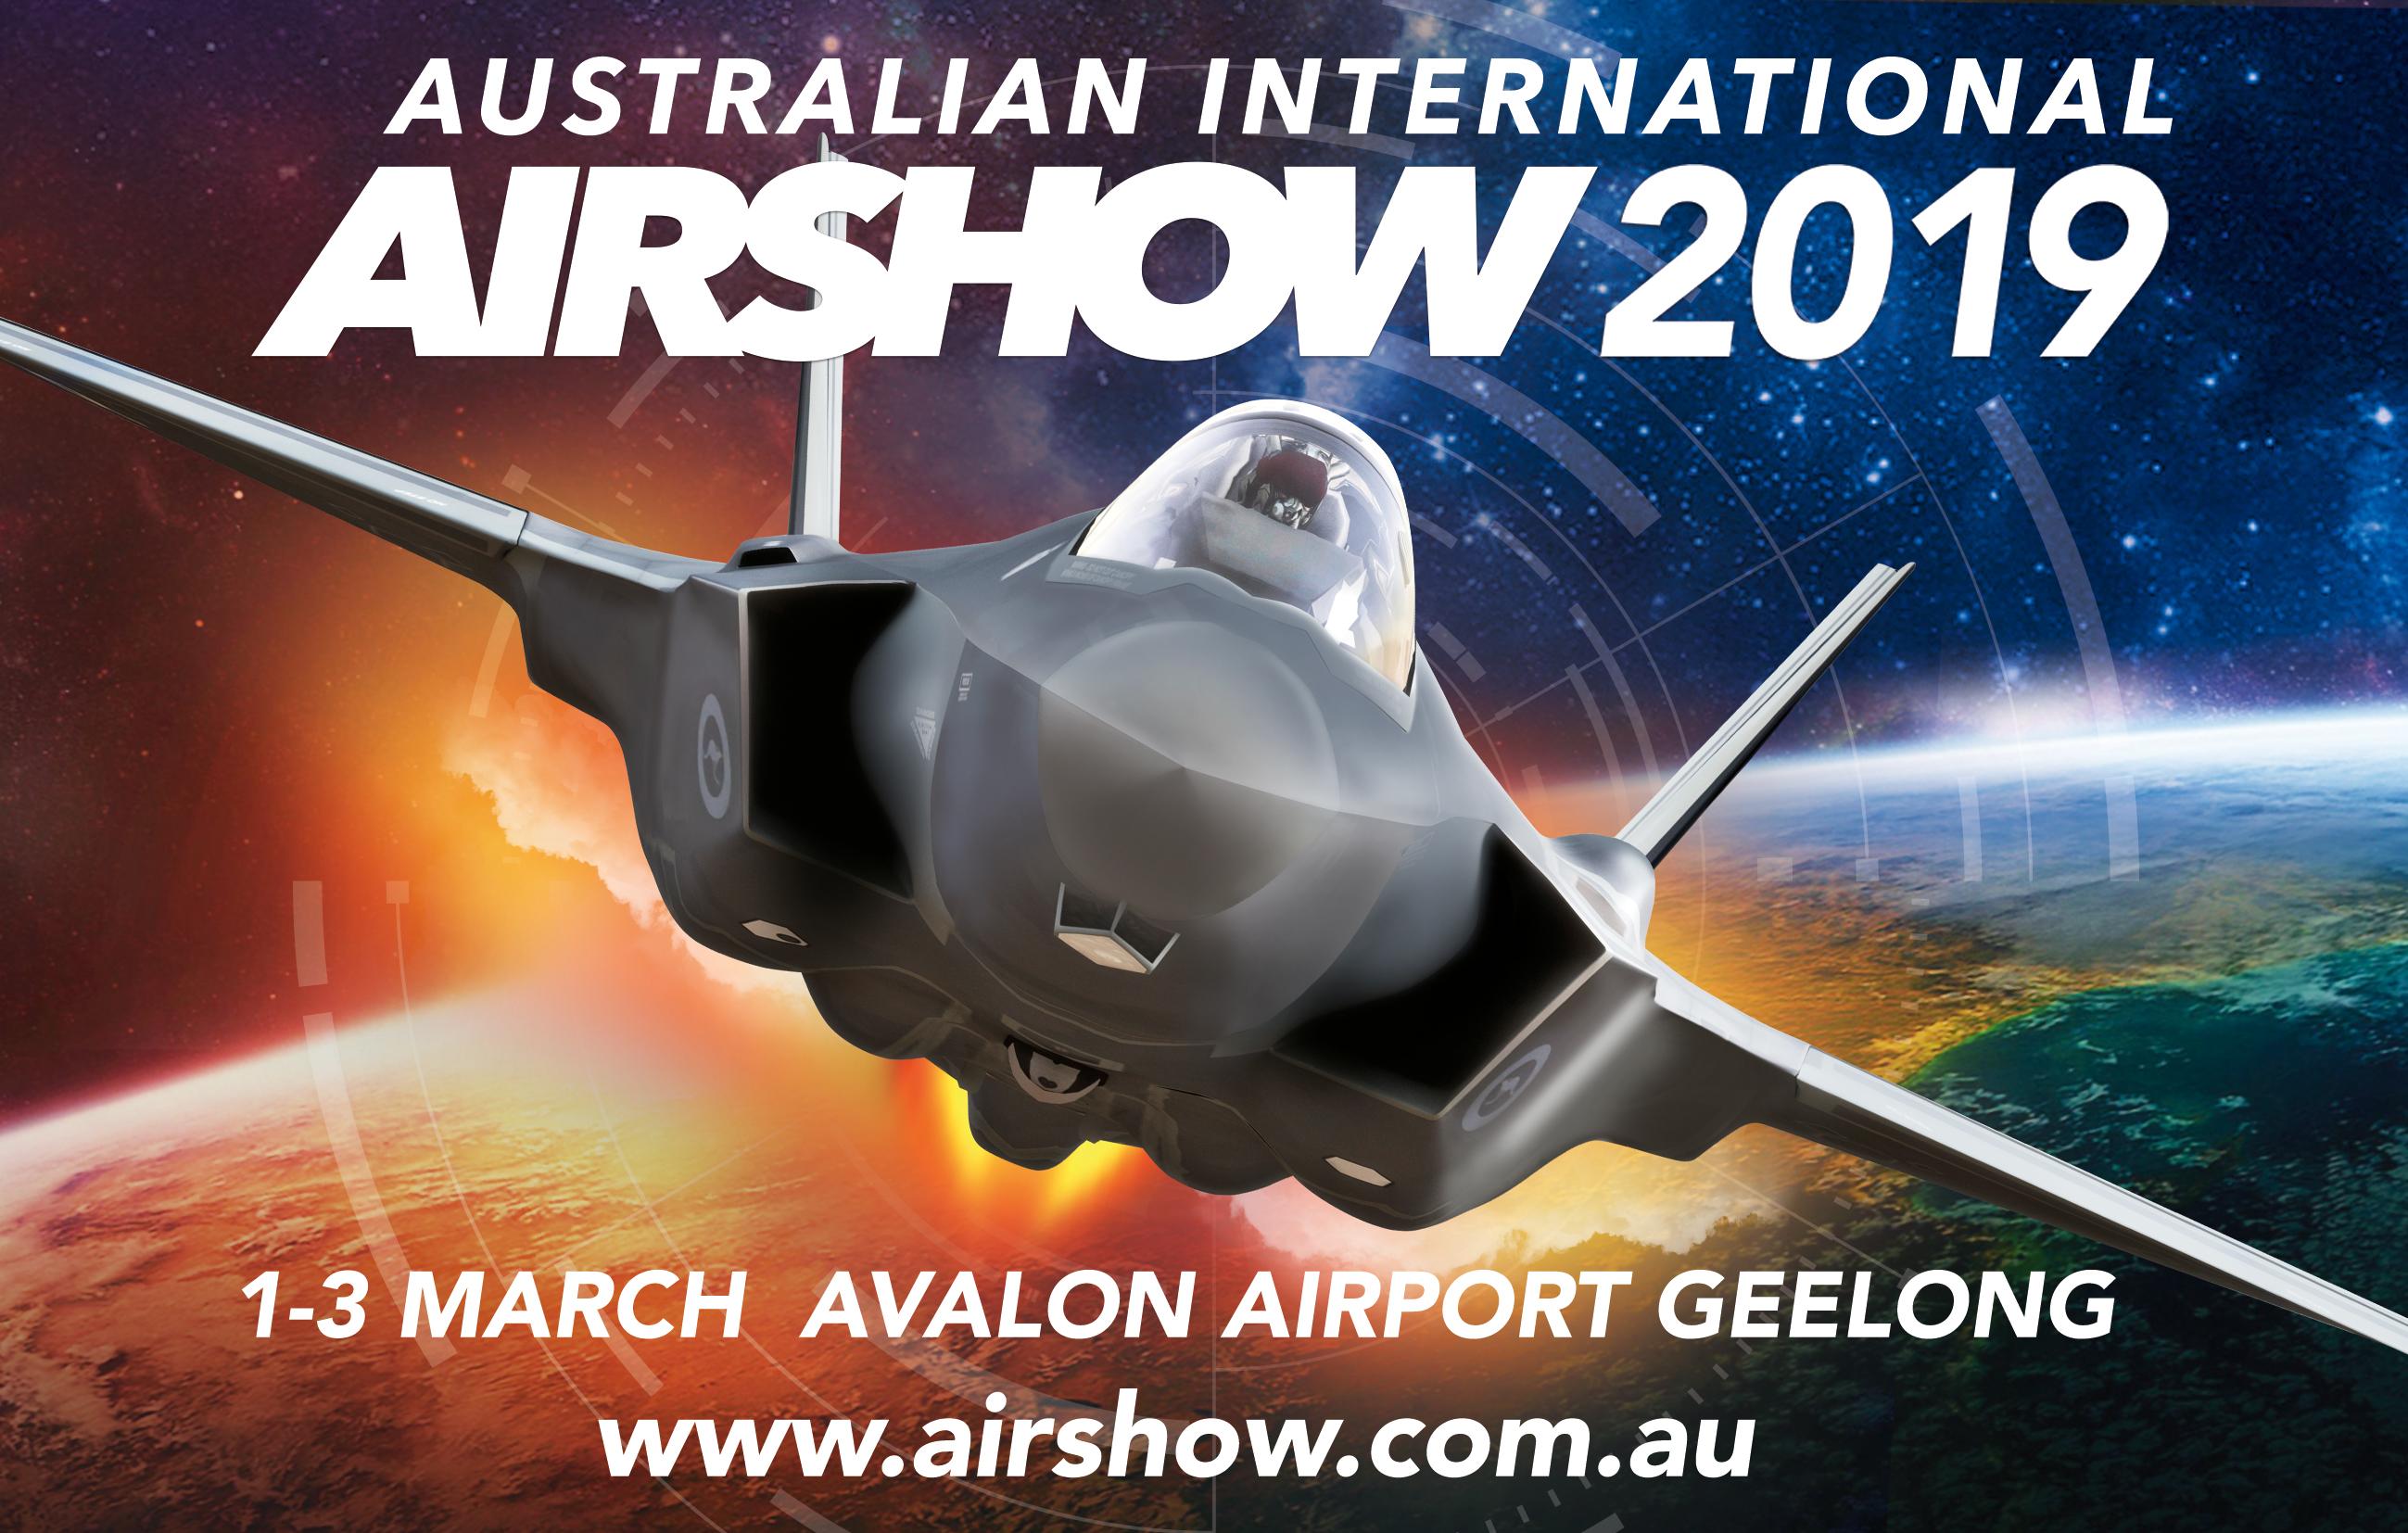 AIRSHOW2019-22X14